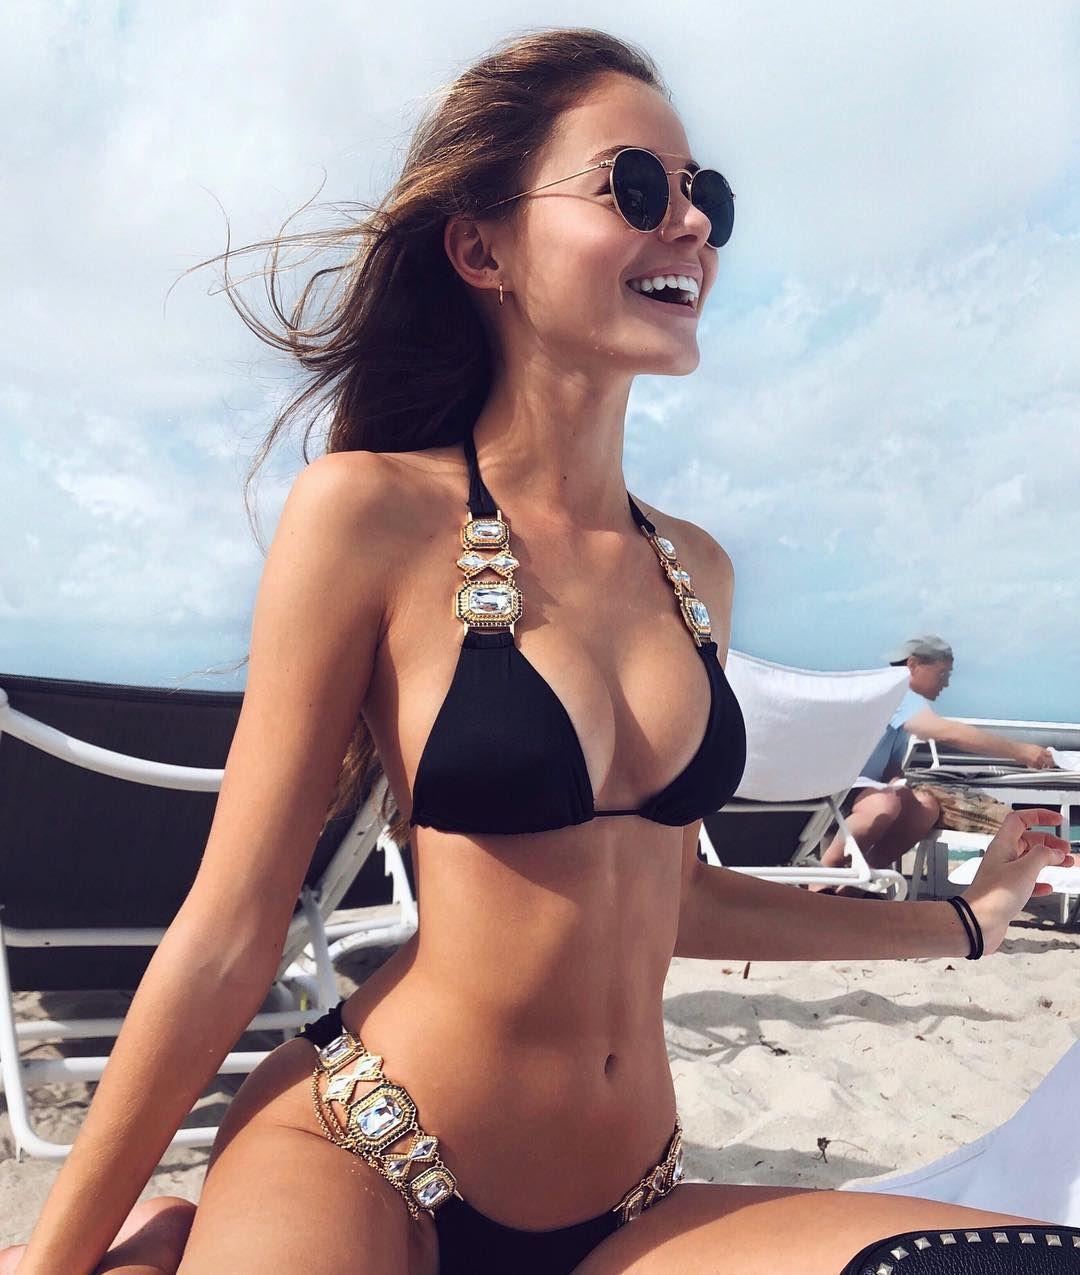 Sexy Petite Brunette Model Daniella Beckerman Nice Cleavage In A Black String Bikini